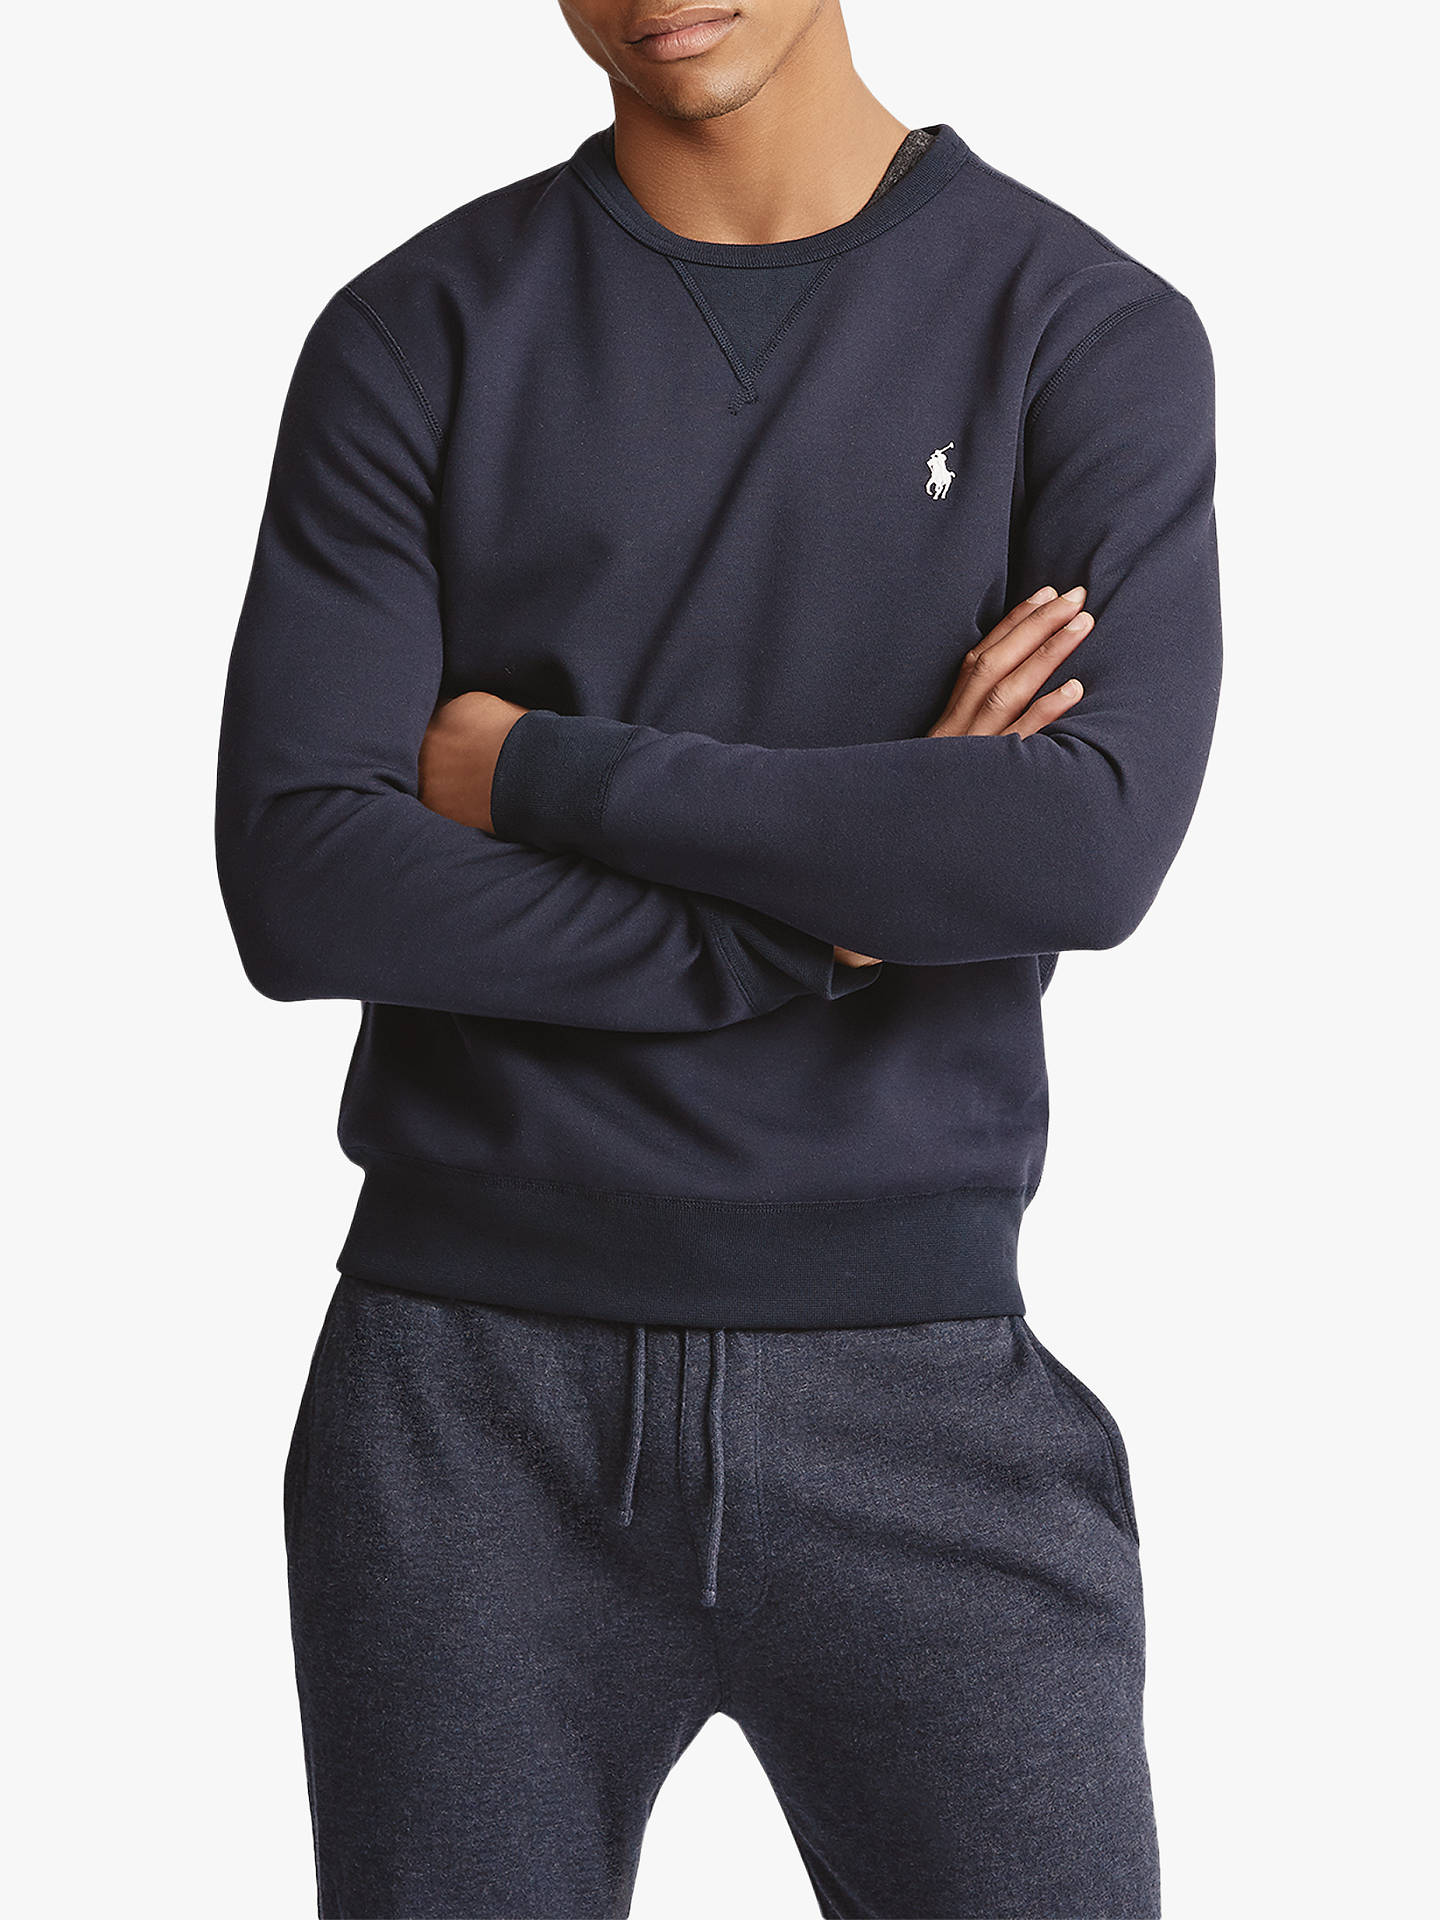 5097fcc6d Buy Polo Ralph Lauren Double Knit Sweatshirt